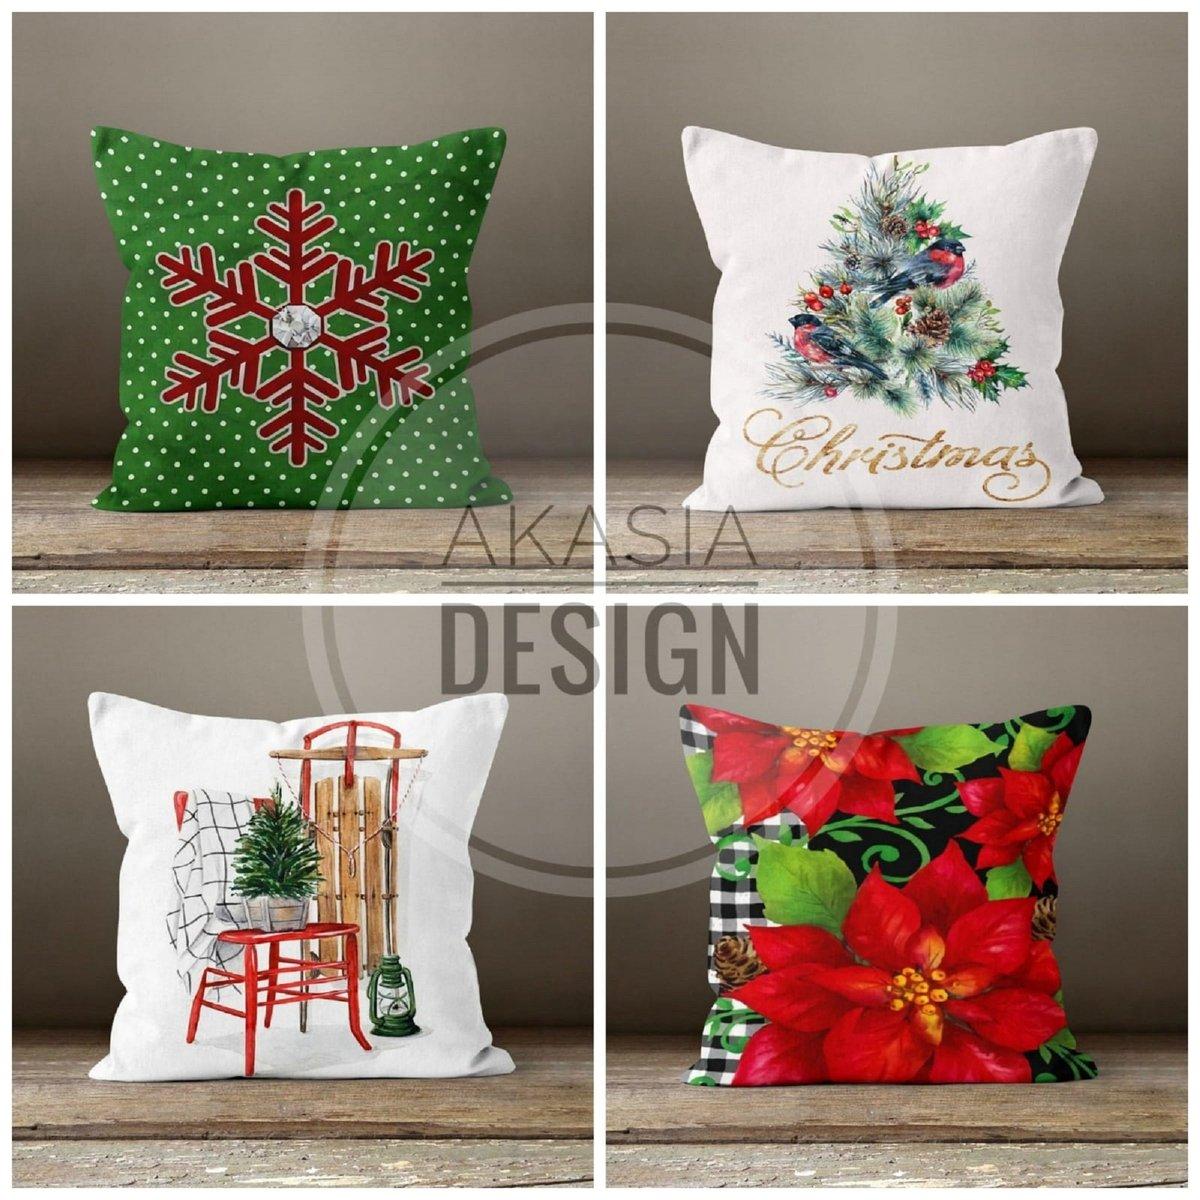 Latest addition to my #etsyshop :Christmas Pillow Covers#happyholiday #xmasdecorideas #christmastree #xmasgiftideas #pillowcovers #redberries #merrychristmas #etsy #wintertrend #xmashomedecor #floral #junglebells #happynewyear #snowflake #christmasdecor @Etsy https://t.co/FApt6nxyWE